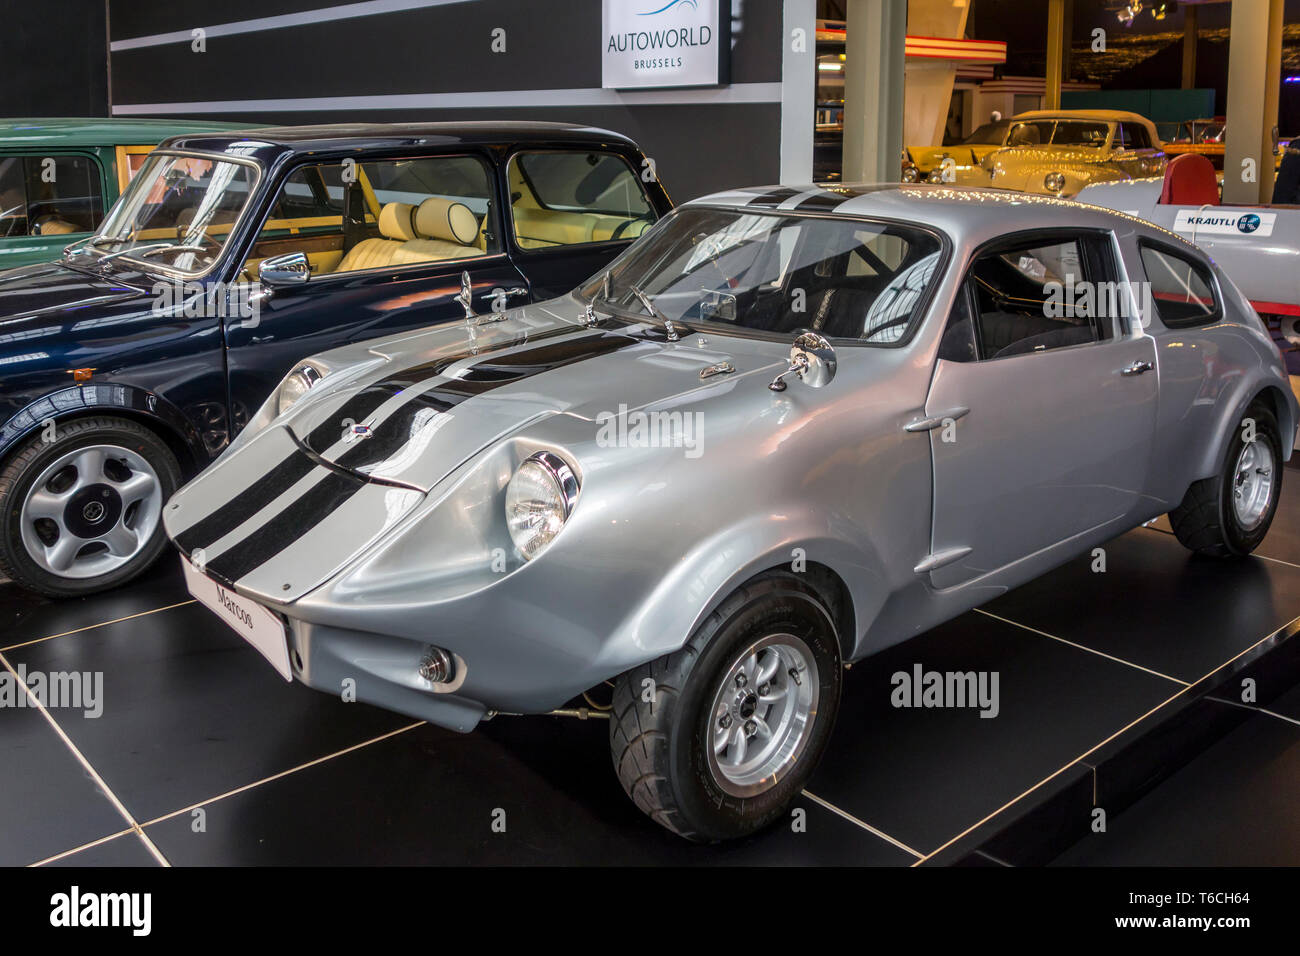 1974 Mini Marcos Mark IV / MK4, British classic 2-door coupé sports car at Autoworld, vintage car museum in Brussels, Belgium - Stock Image